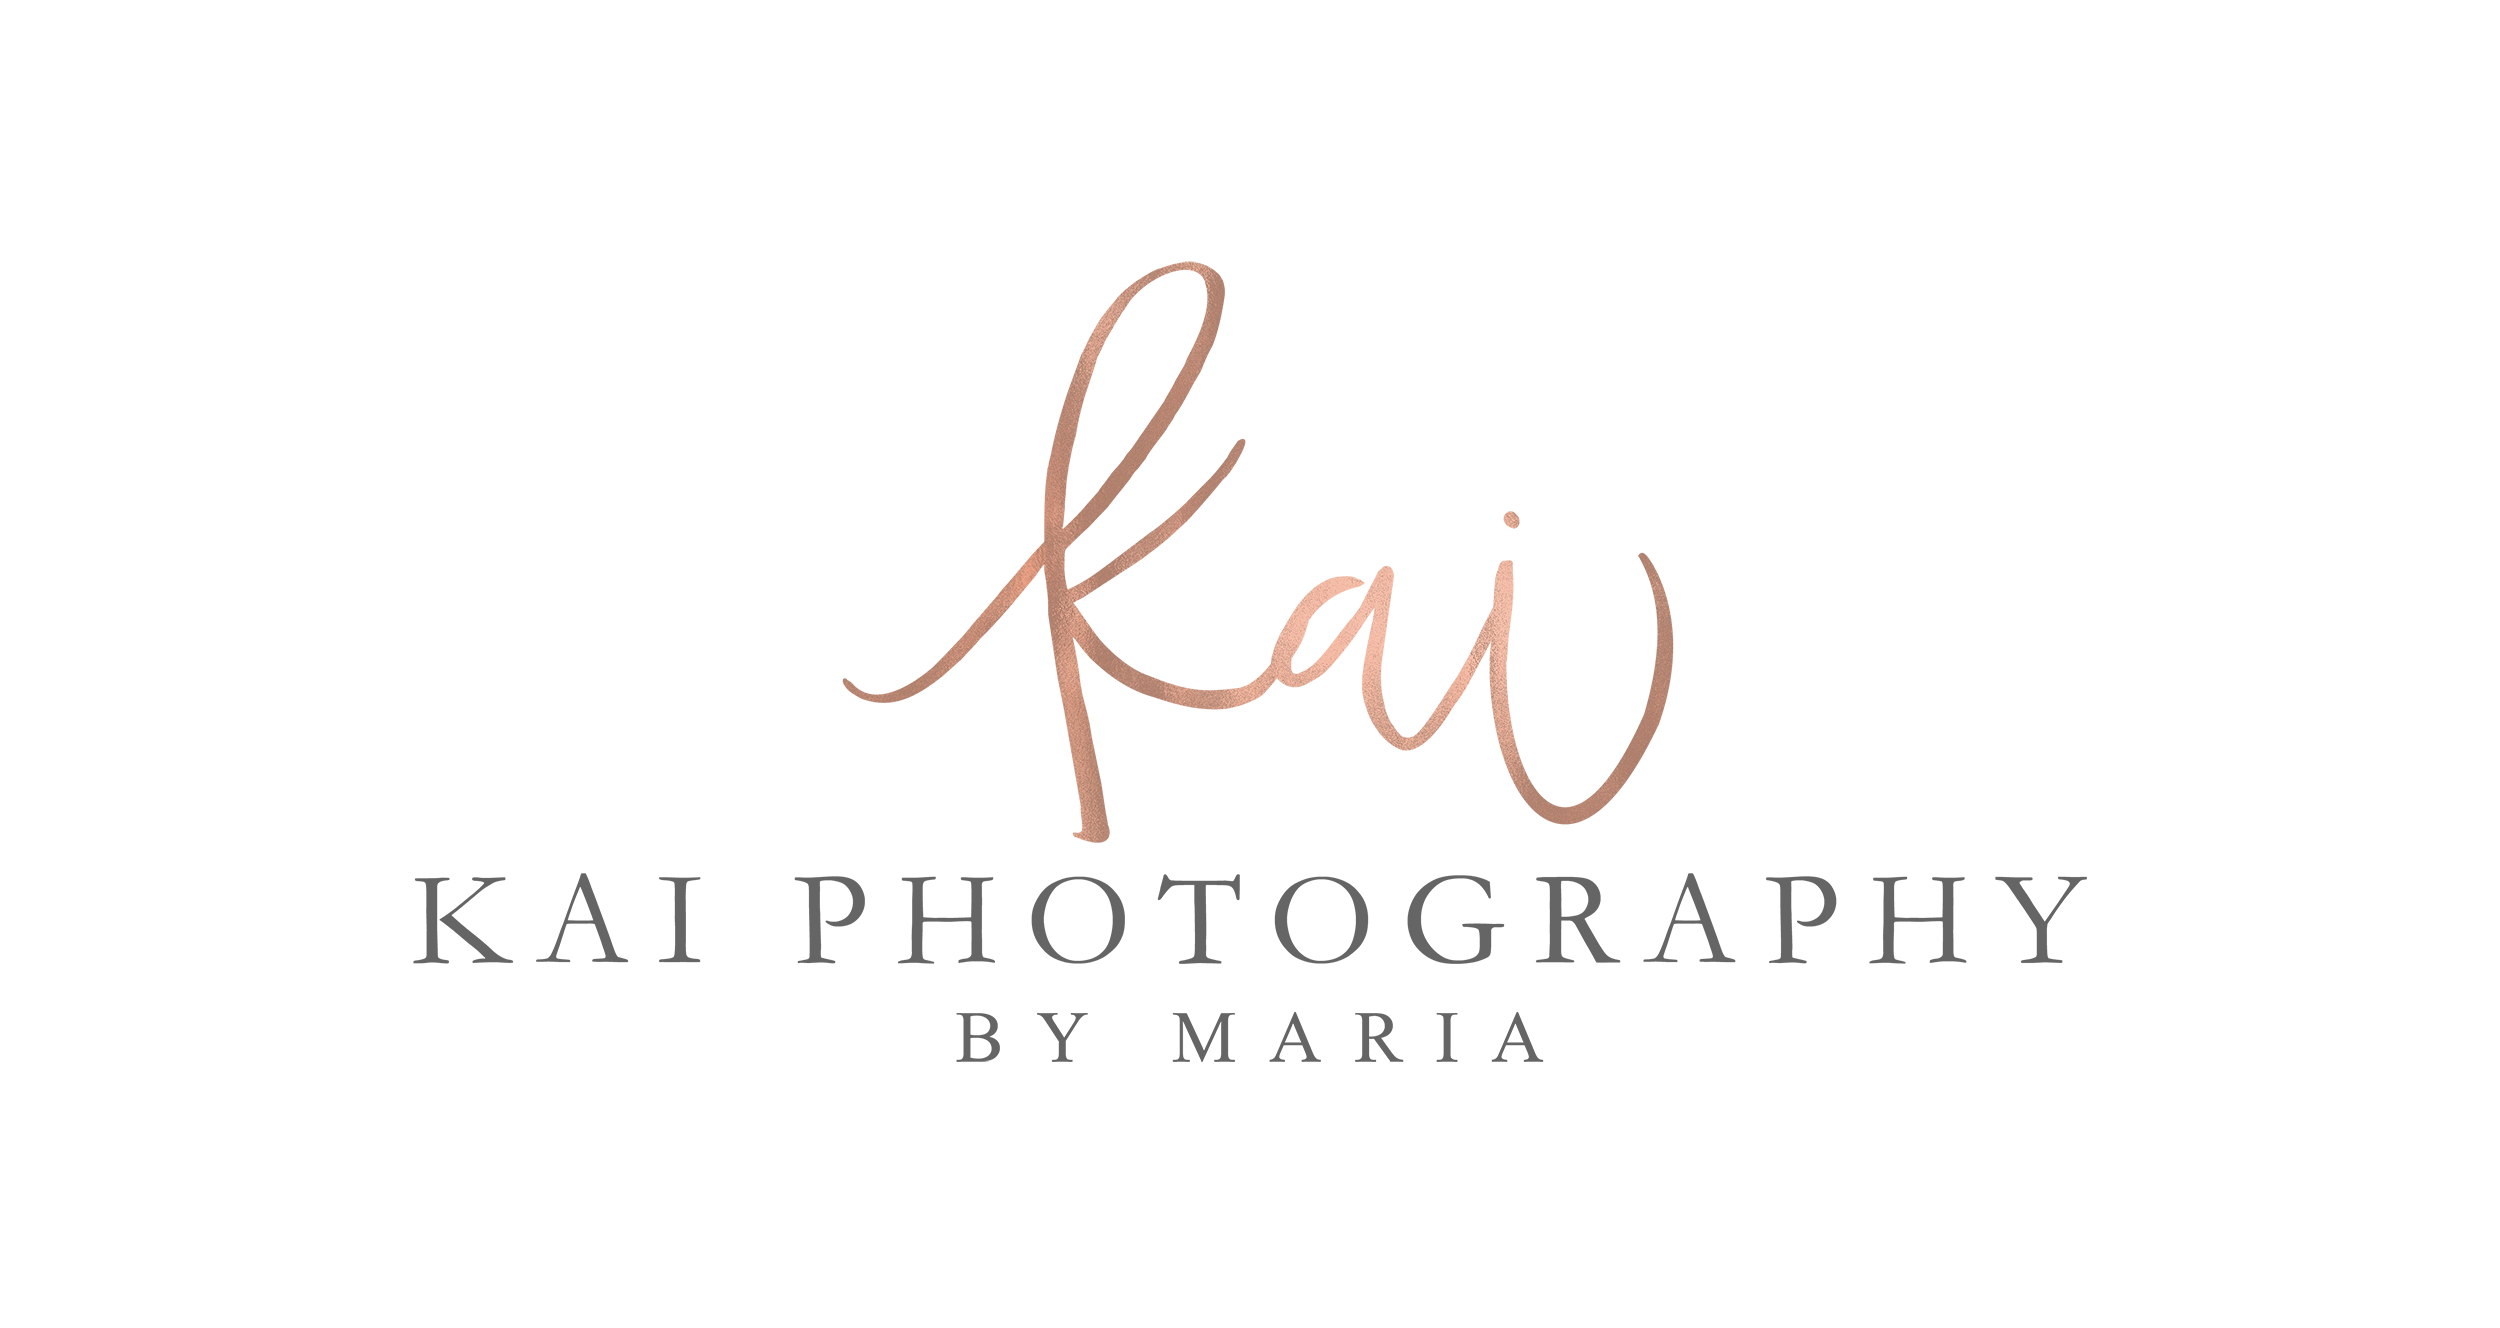 kai photography by Maria